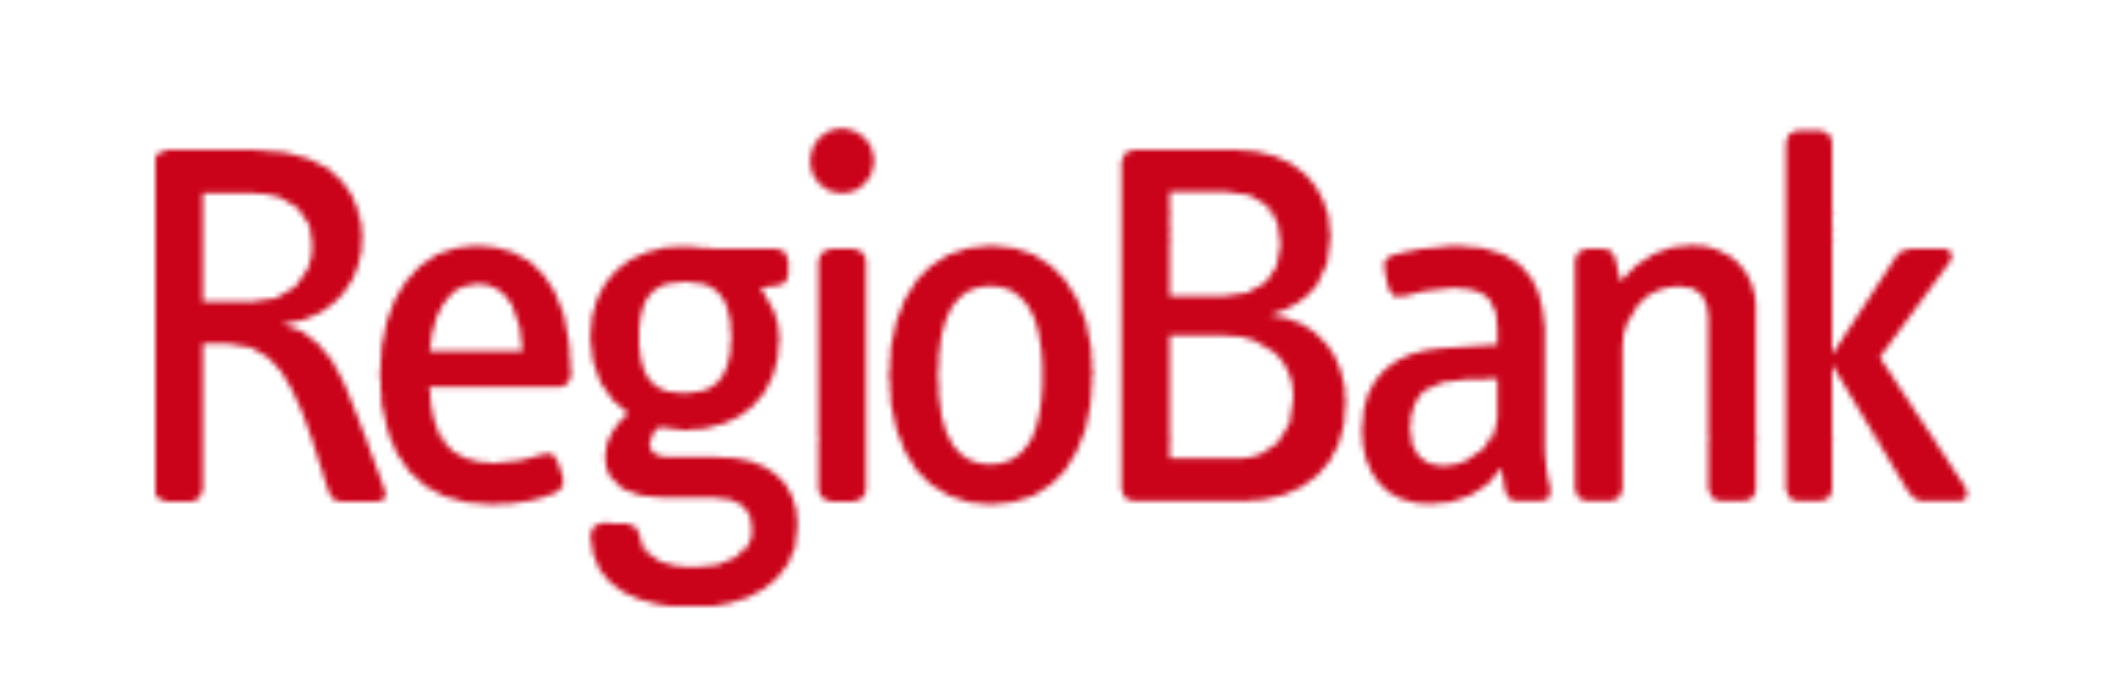 svBasteom-Regiobank-button-blue